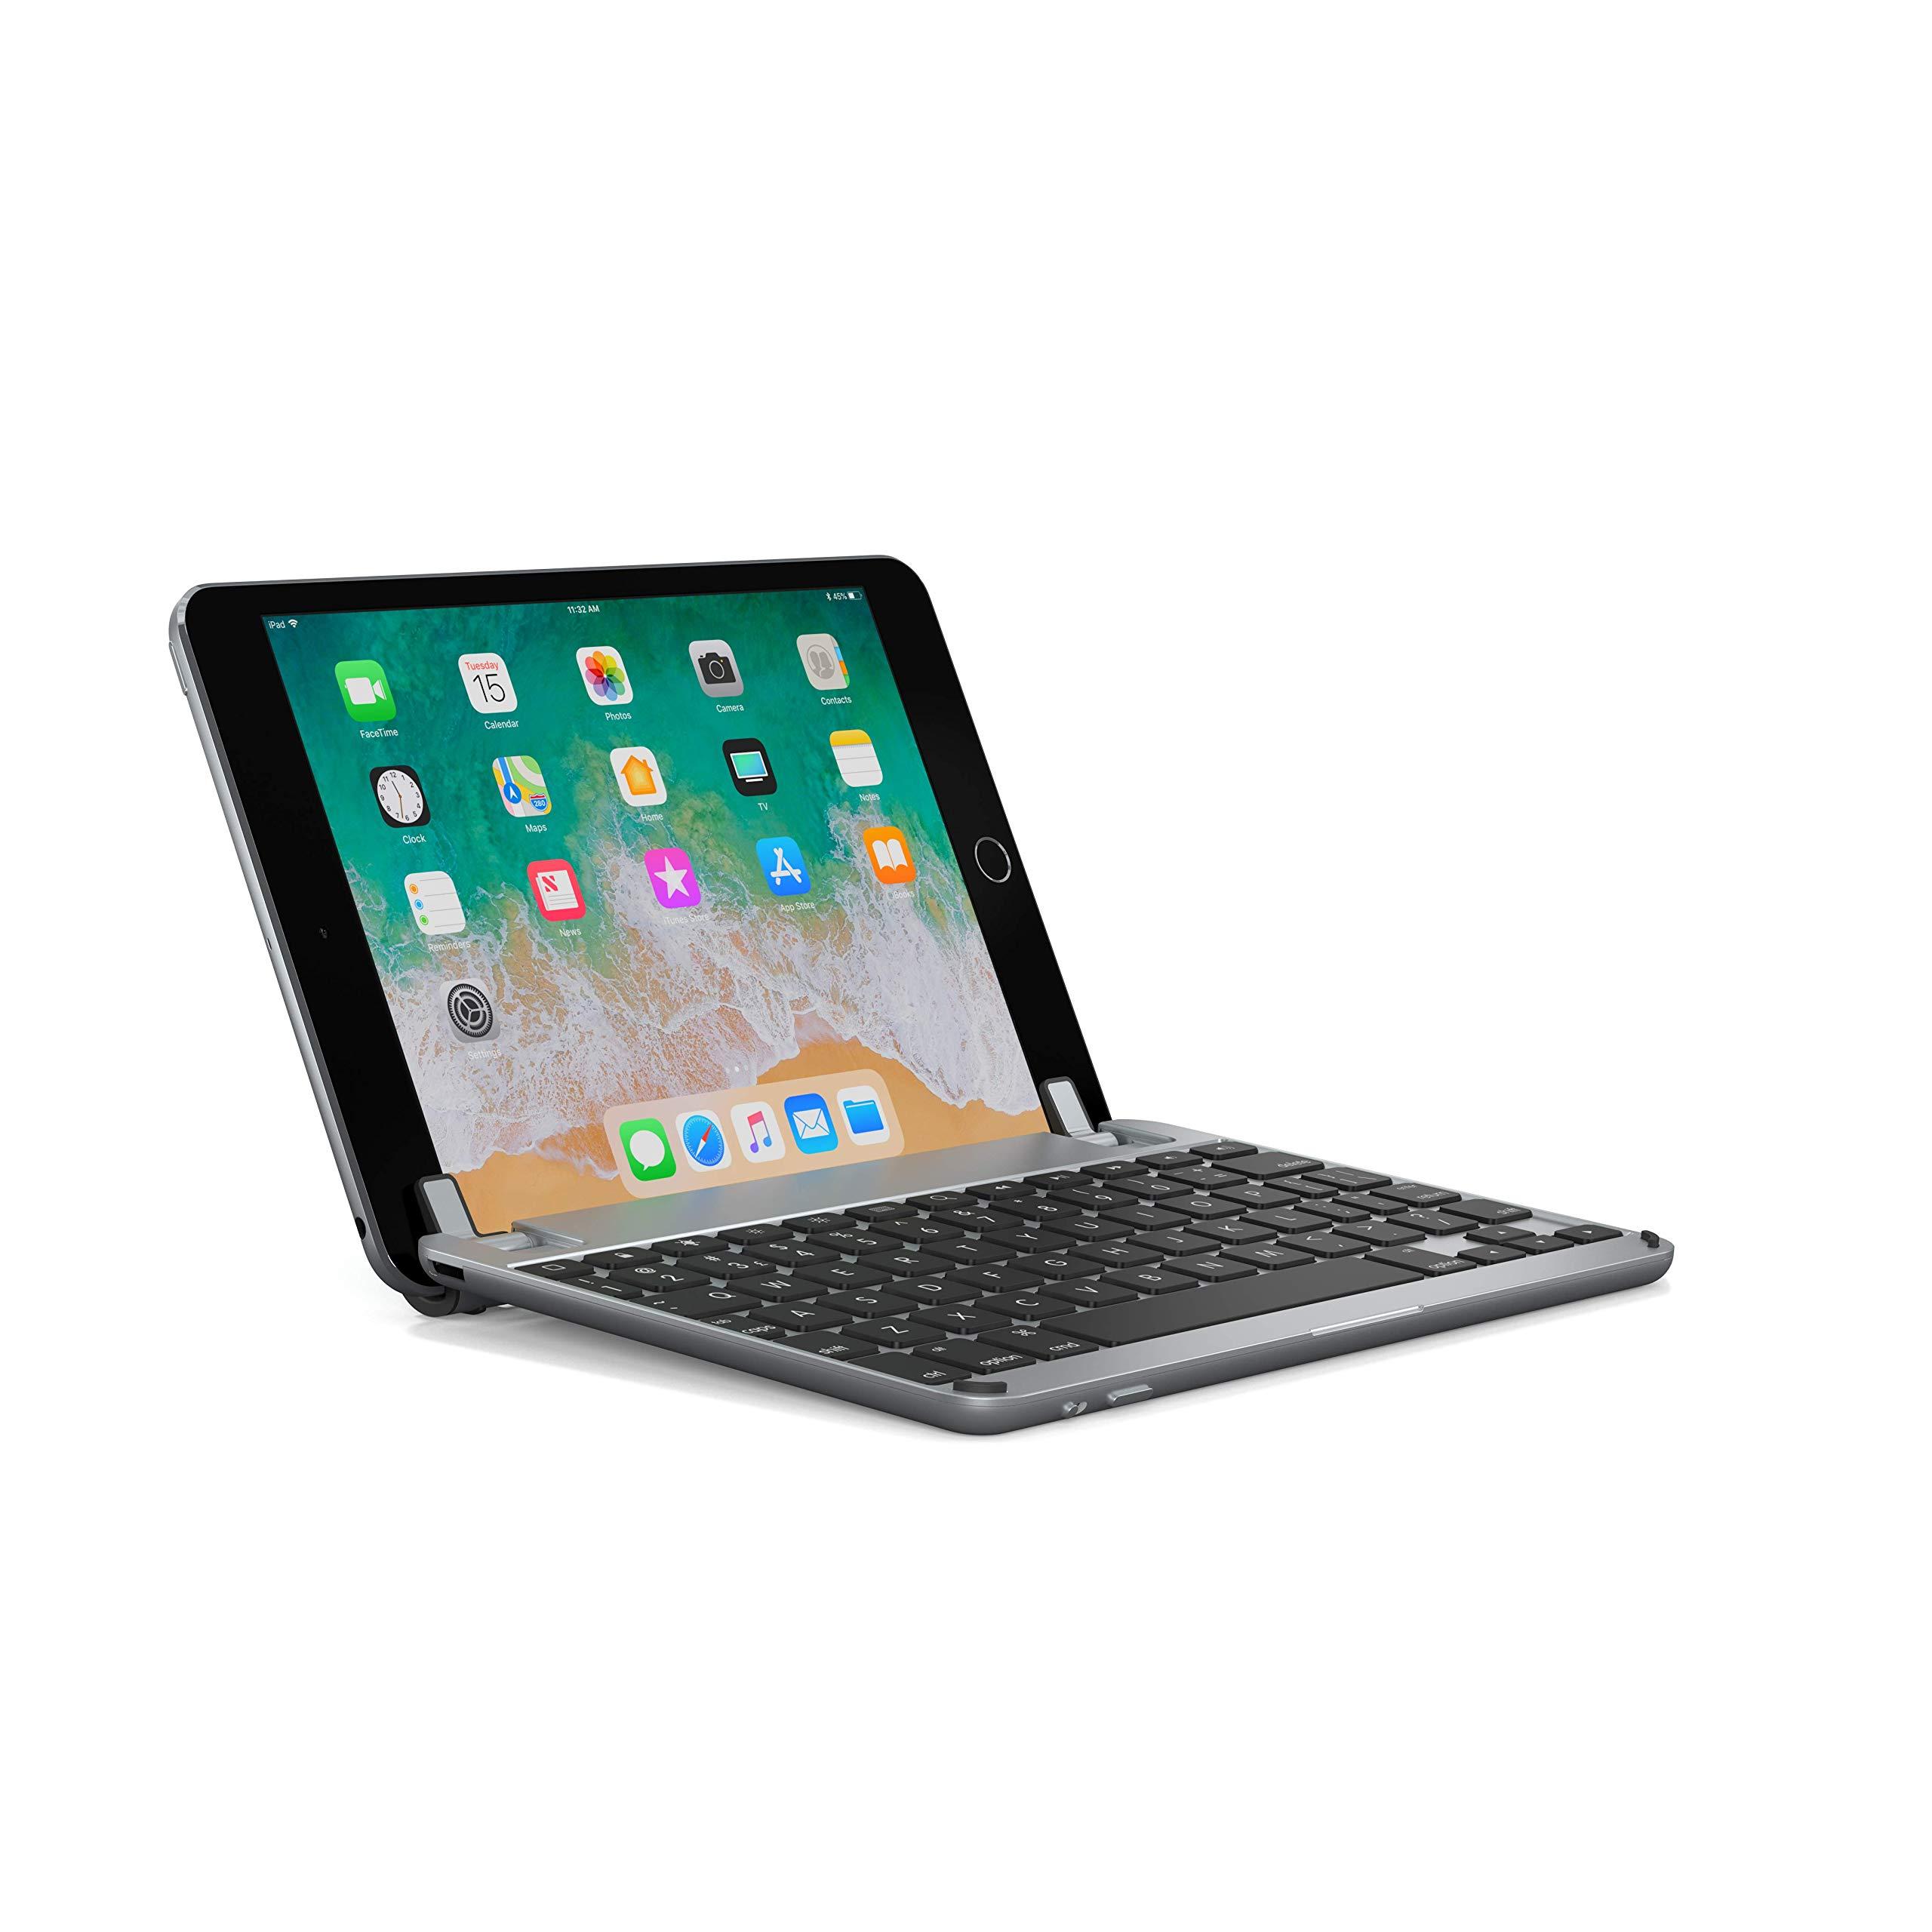 Brydge 7.9 Keyboard for iPad Mini 4 Keyboard. Backlit, Aluminum, Detachable, 180 Degree Viewing. (Space Gray)